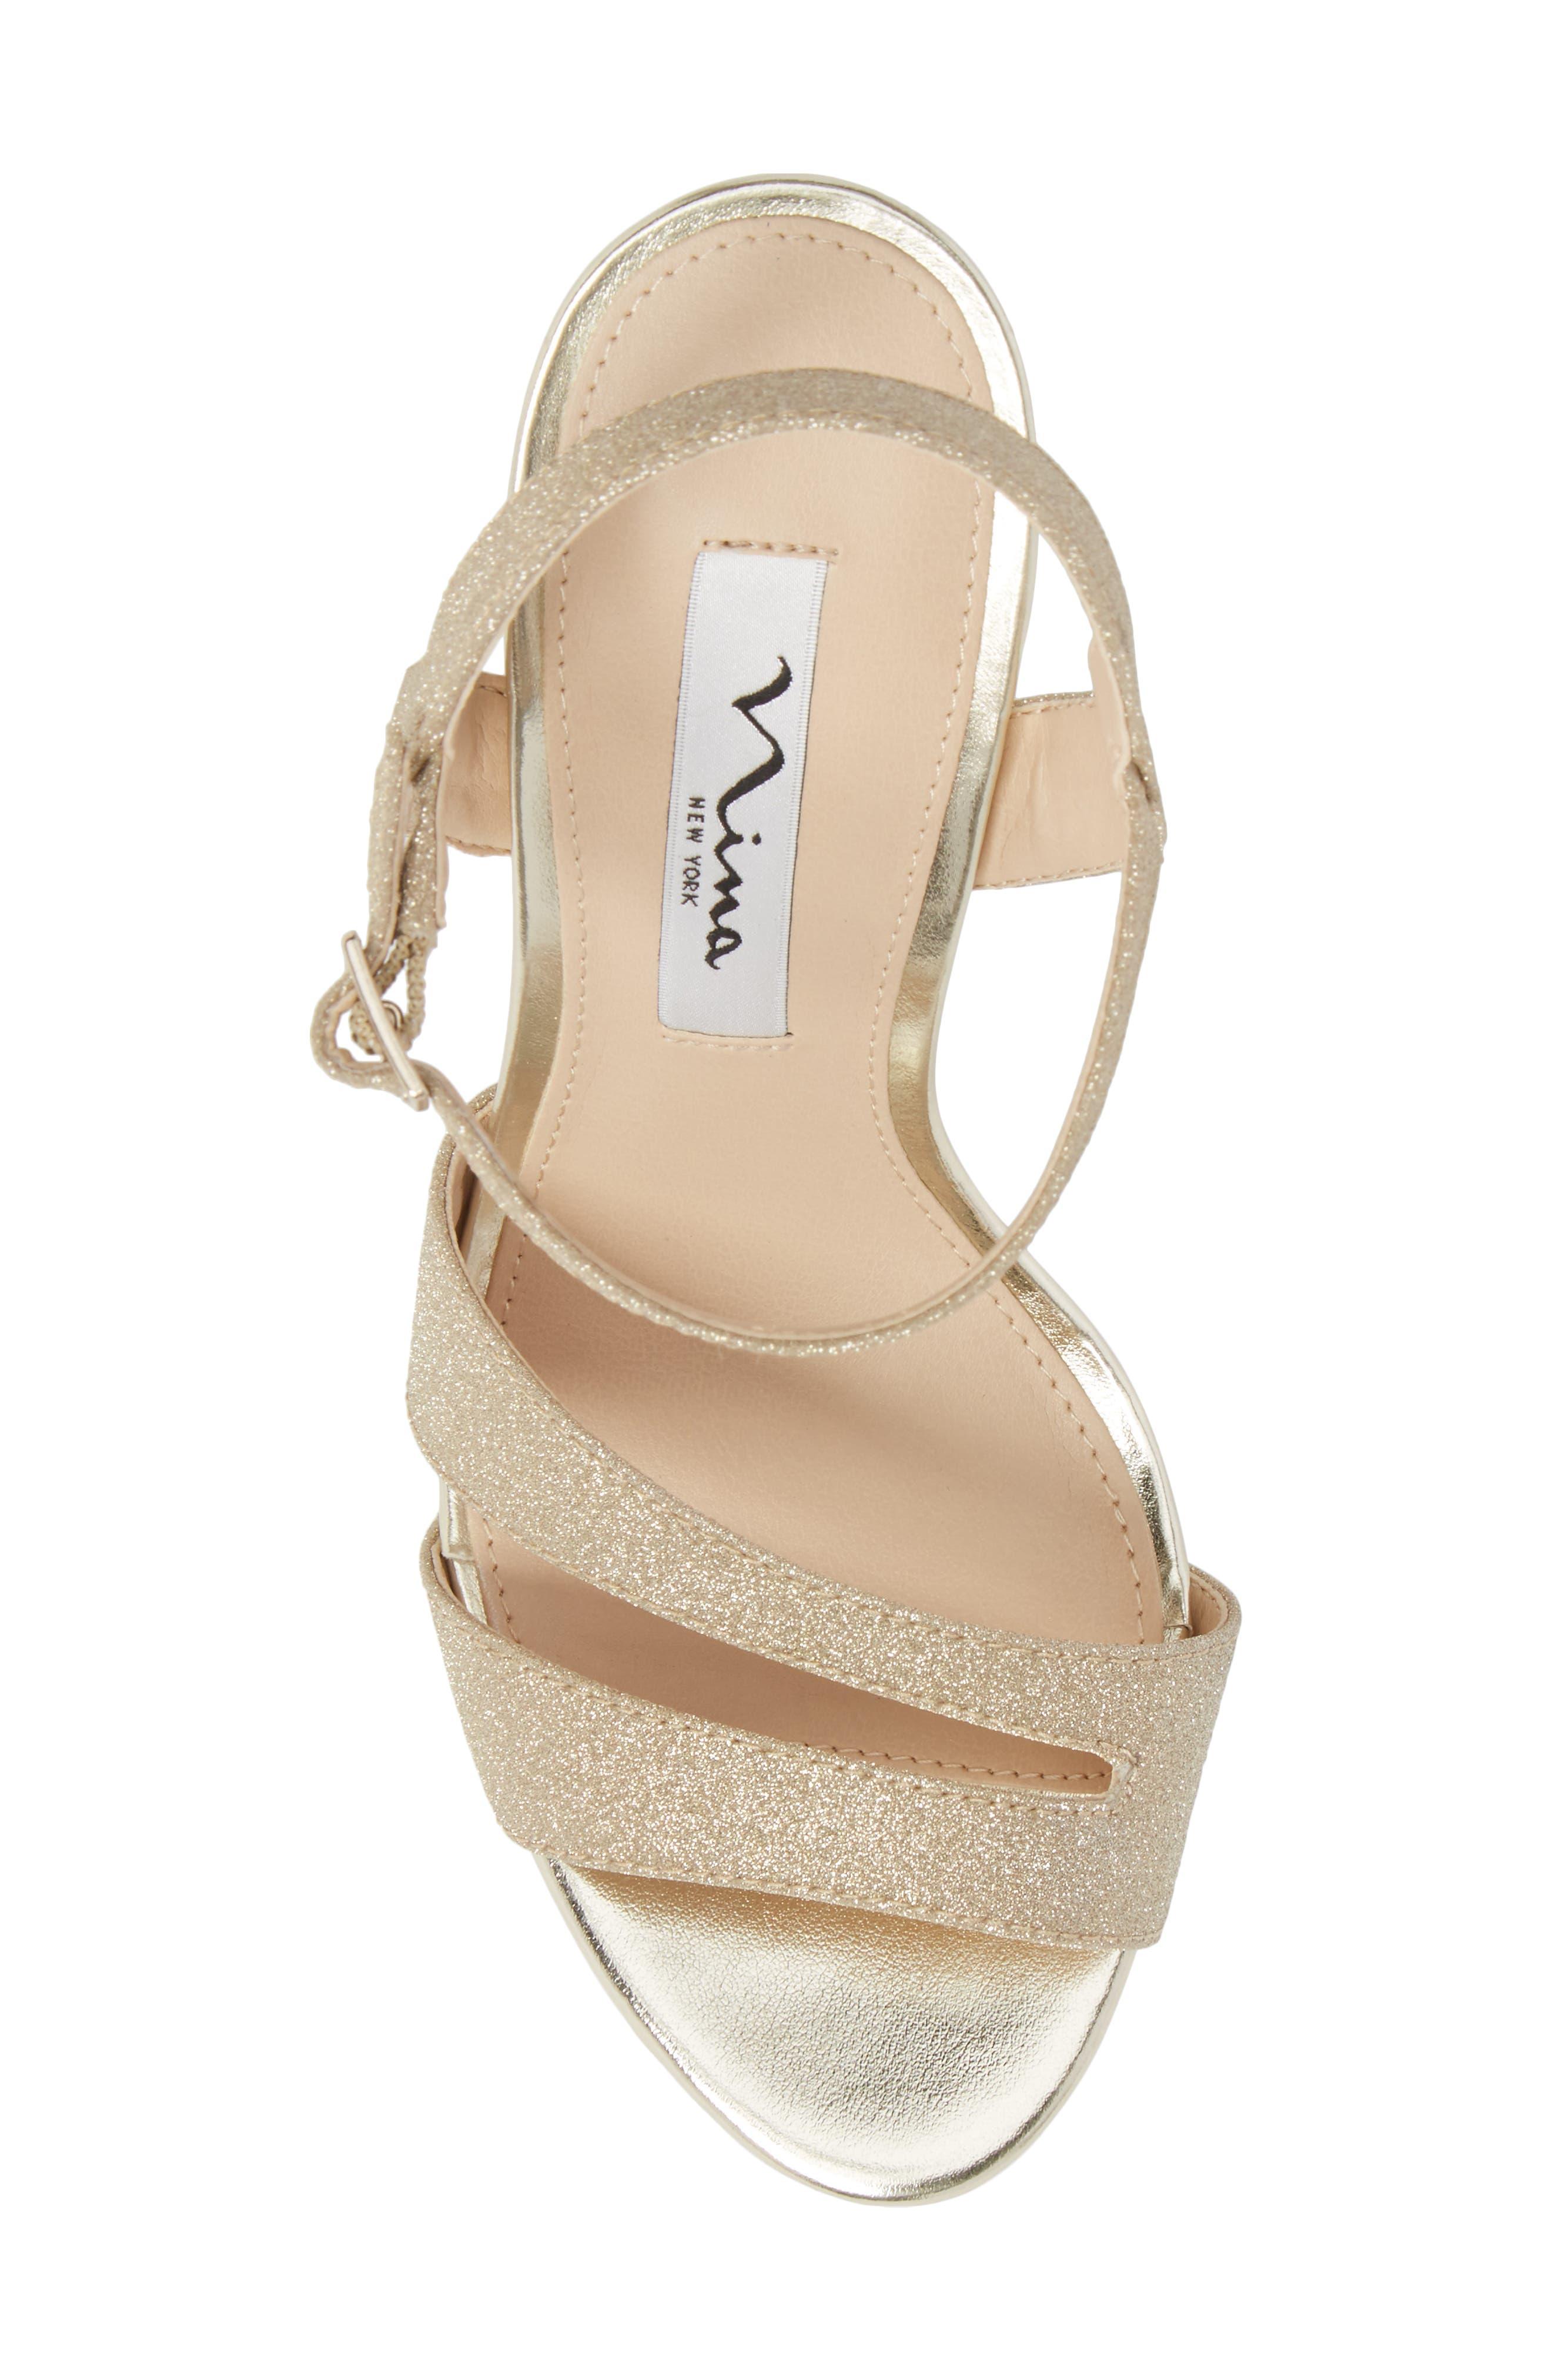 Silana Platform Sandal,                             Alternate thumbnail 5, color,                             Gold Glitter Fabric